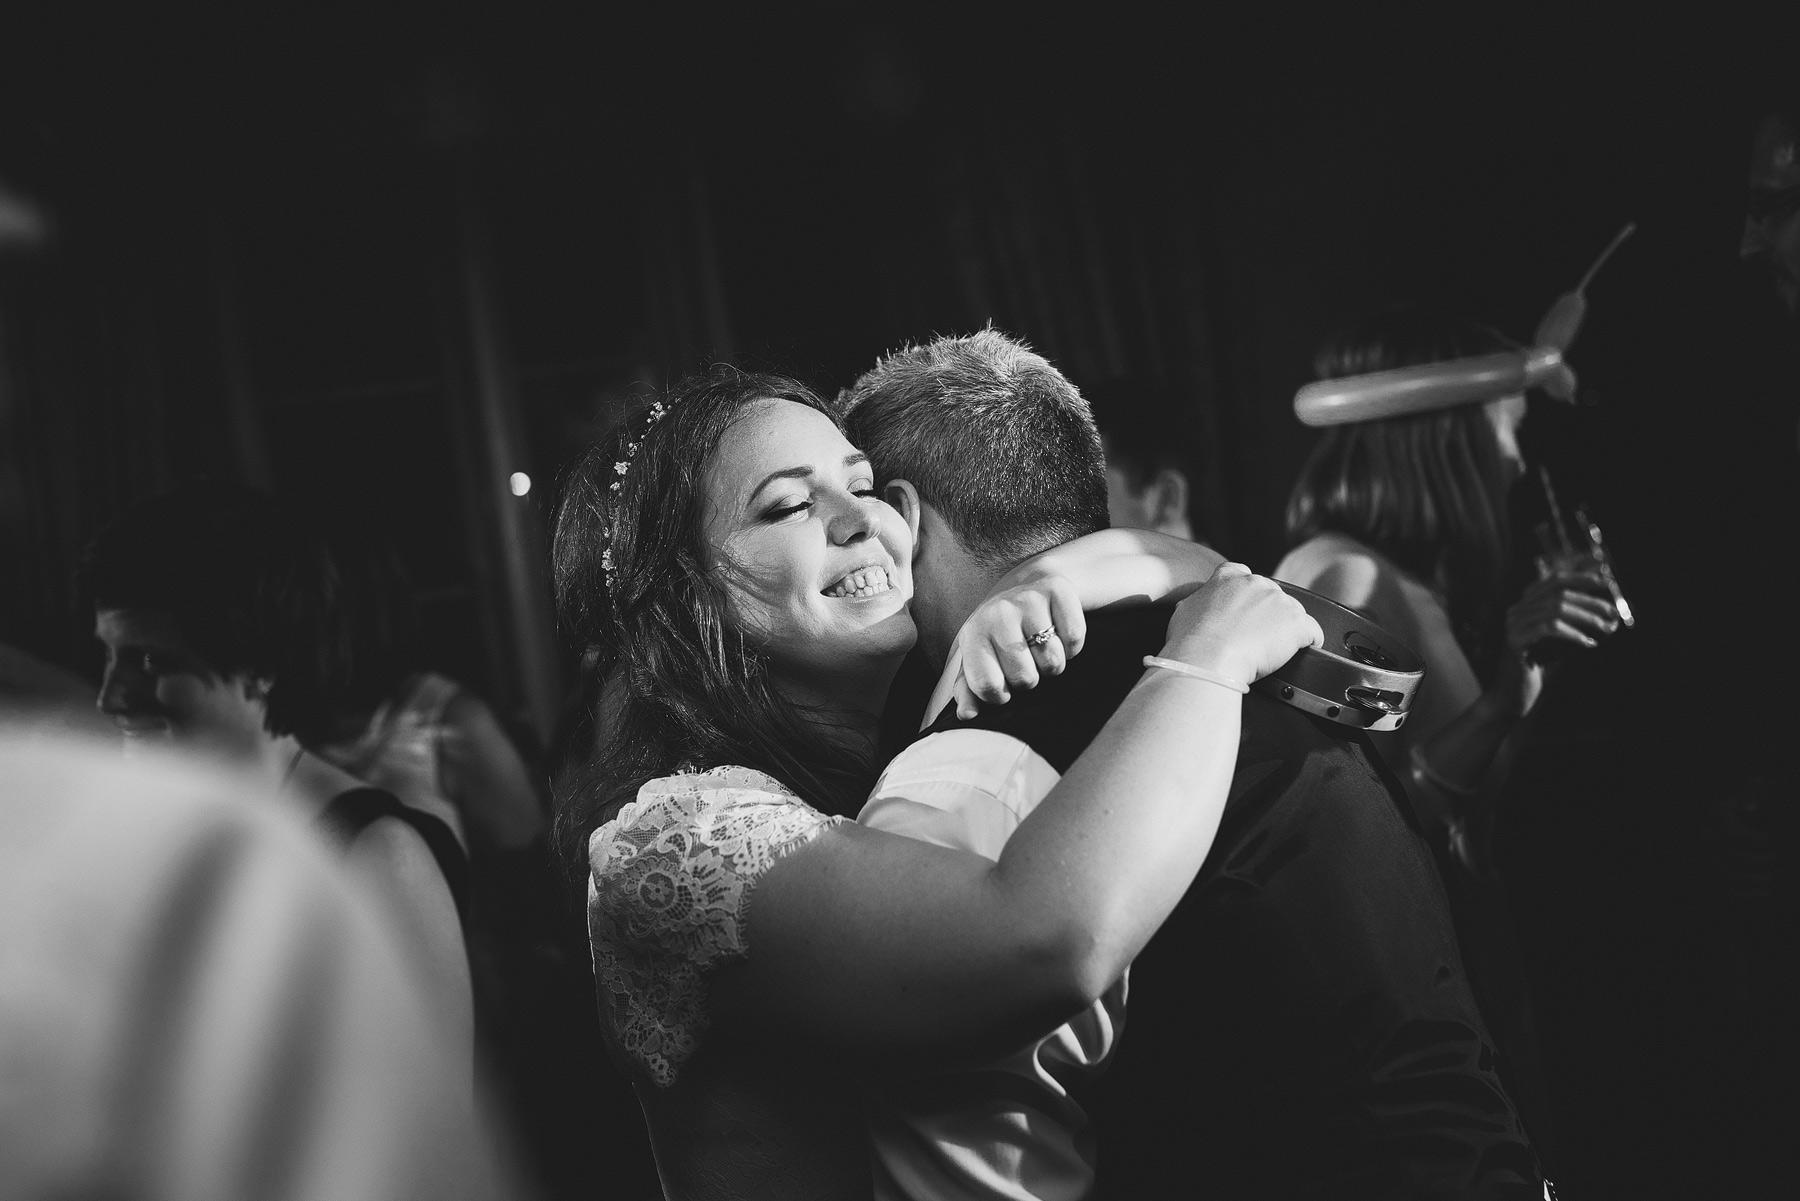 documentary wedding photographer at huntstile farm